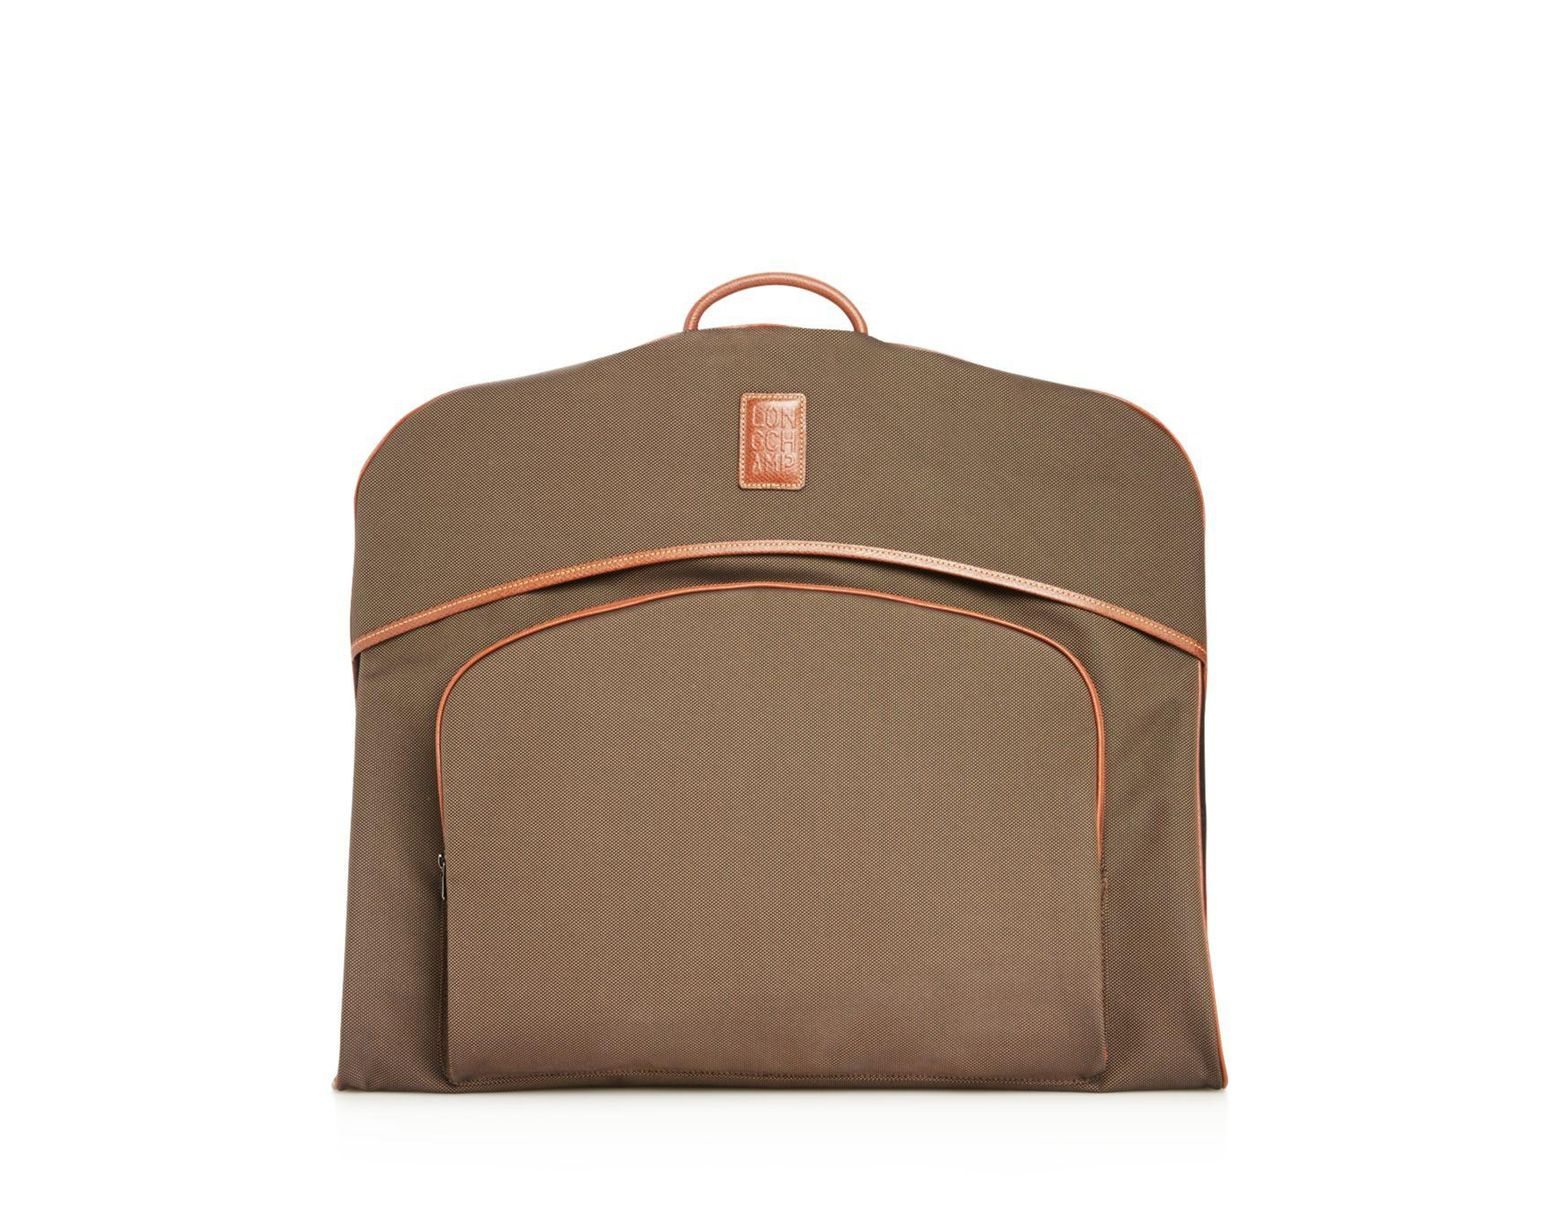 ca0a21c5c Longchamp Boxford Garment Bag in Brown for Men - Lyst